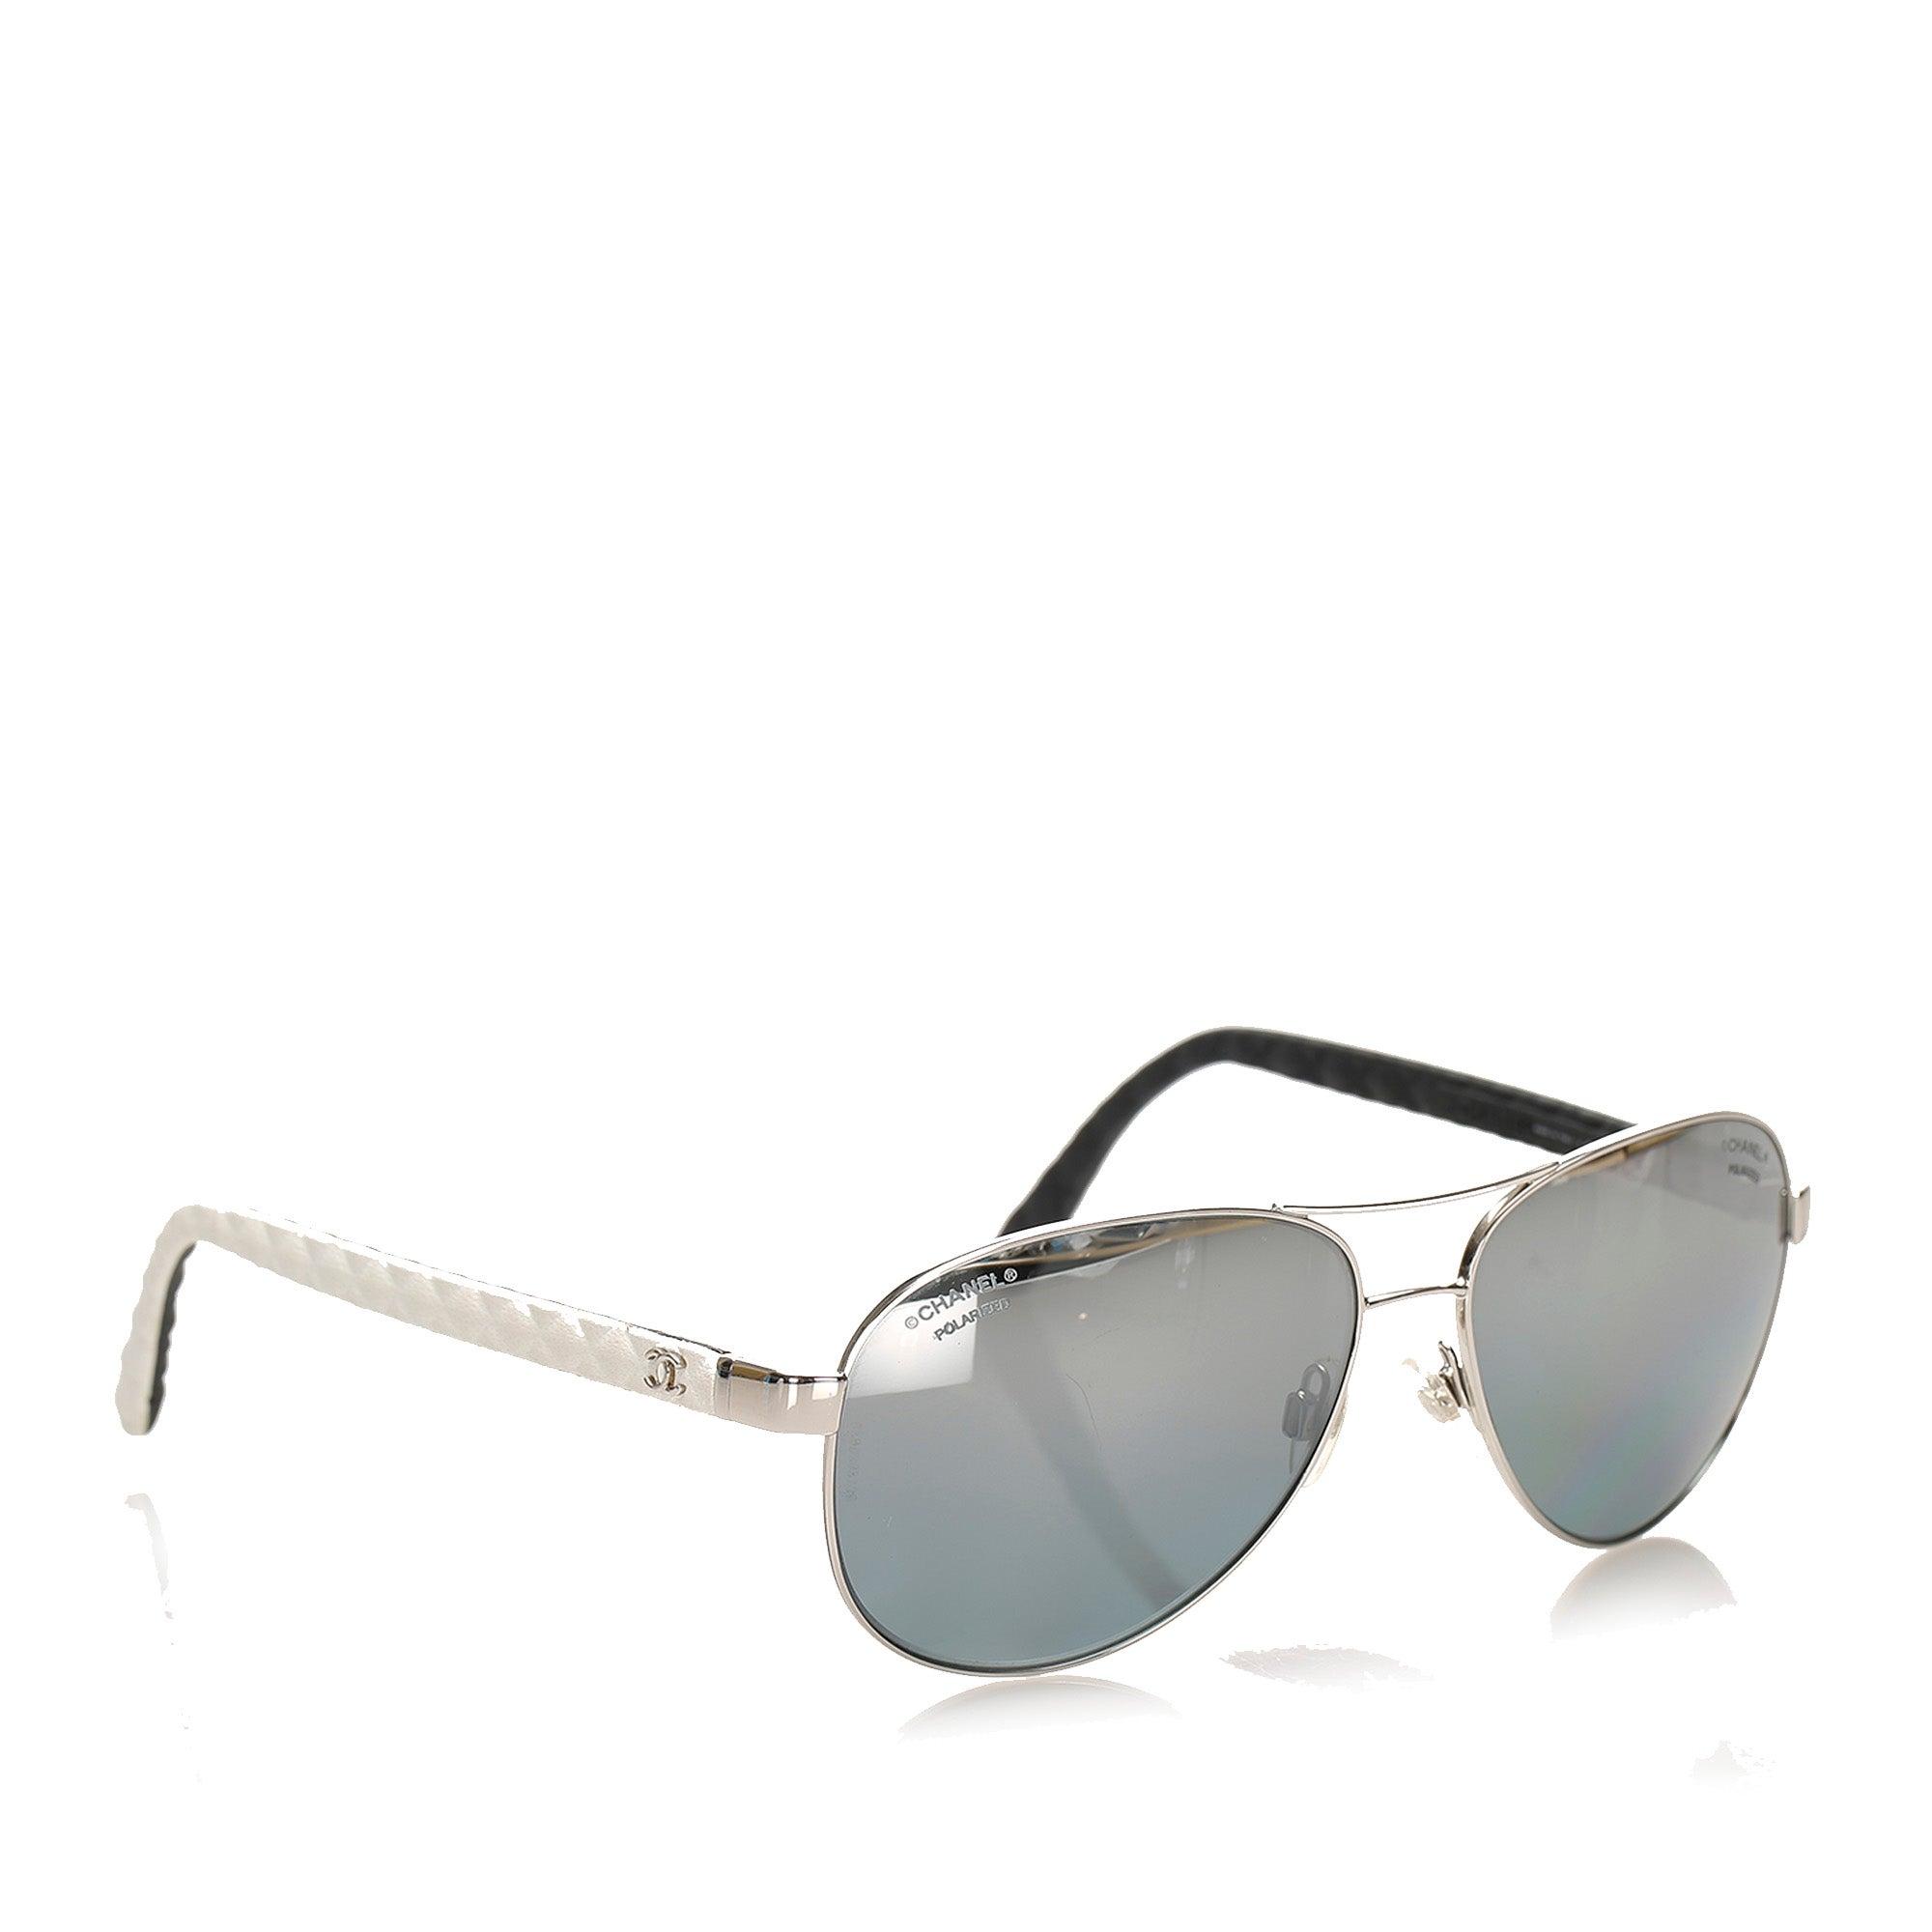 Chanel Aviator Tinted Sunglasses